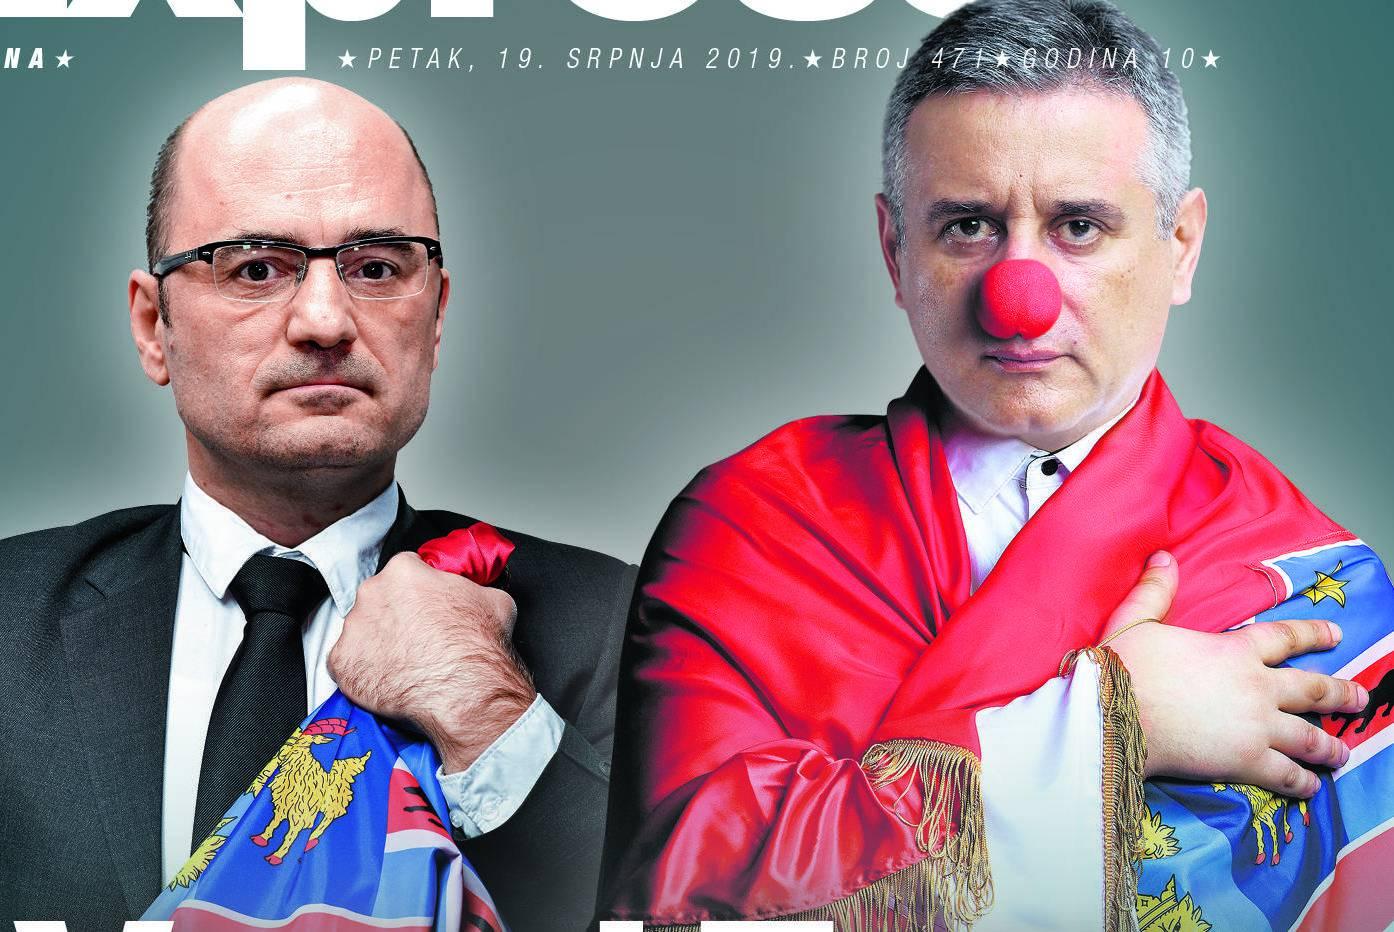 Evo njih opet: Vaso i Tomo skupa ruše Plenkija i ministre